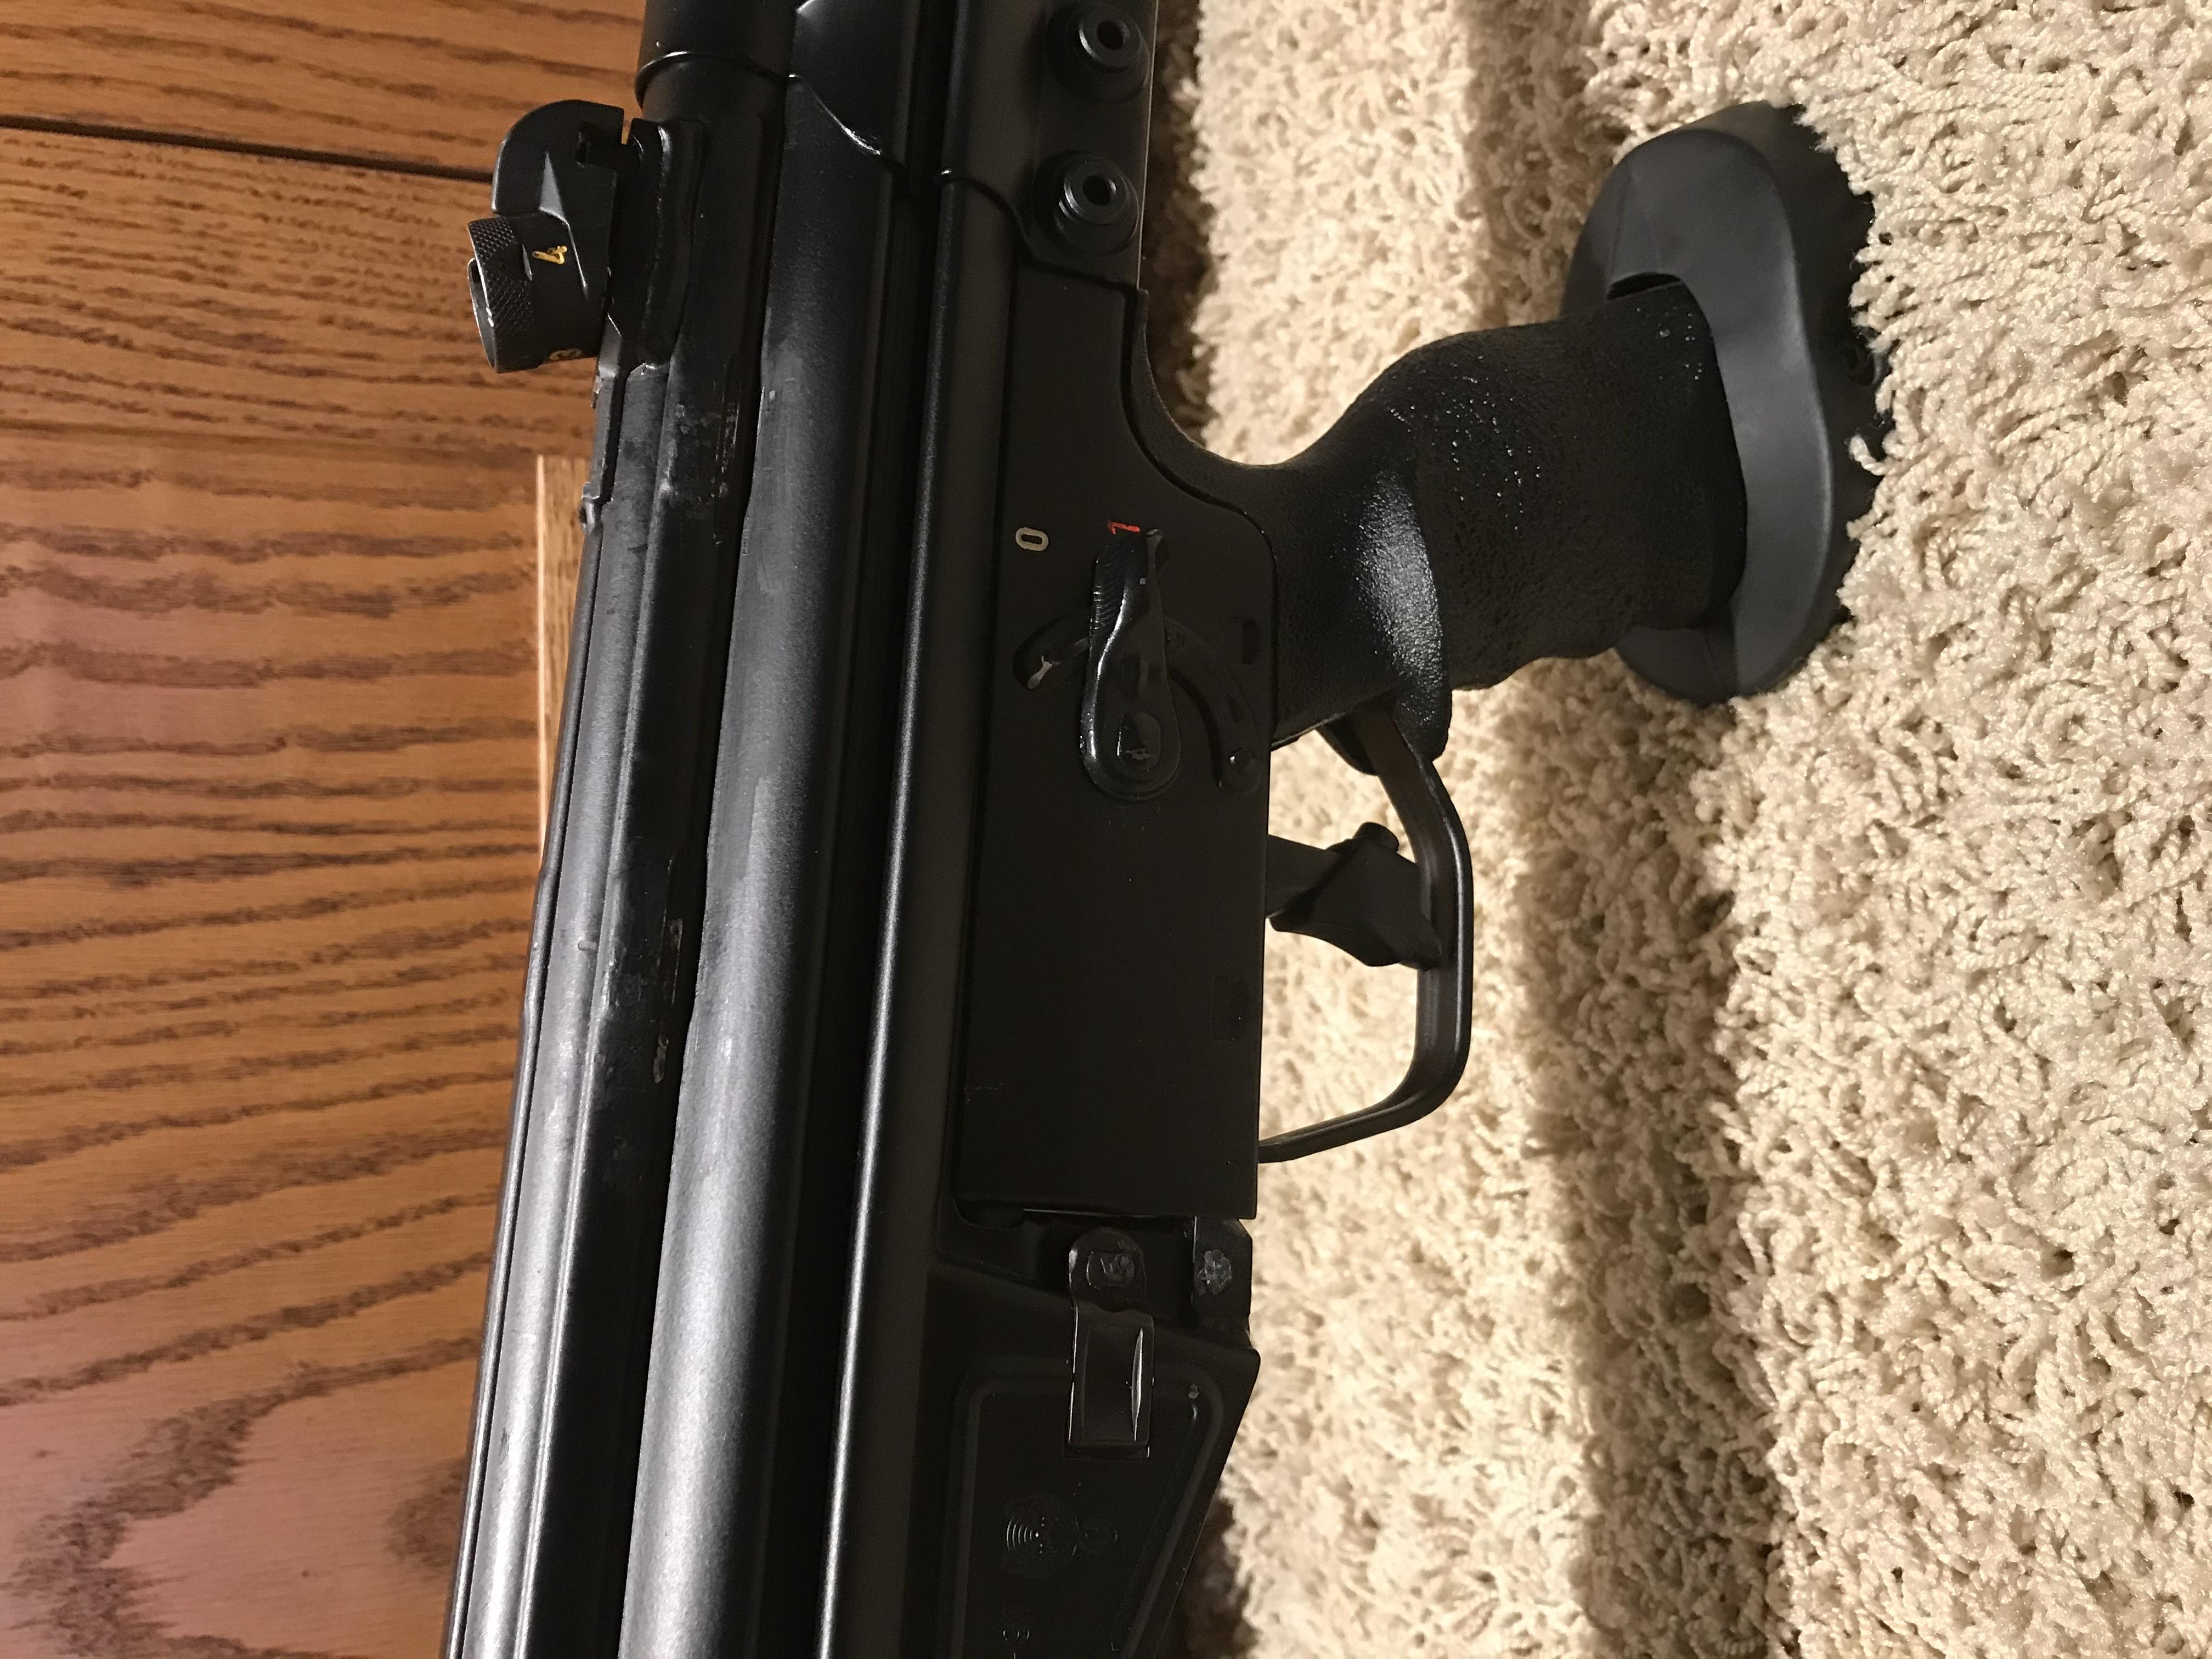 WTS/WTT: Early JLD PTR-91 Target Rifle-e221e27a-64ec-484f-a984-d5afe99aabbf.jpeg